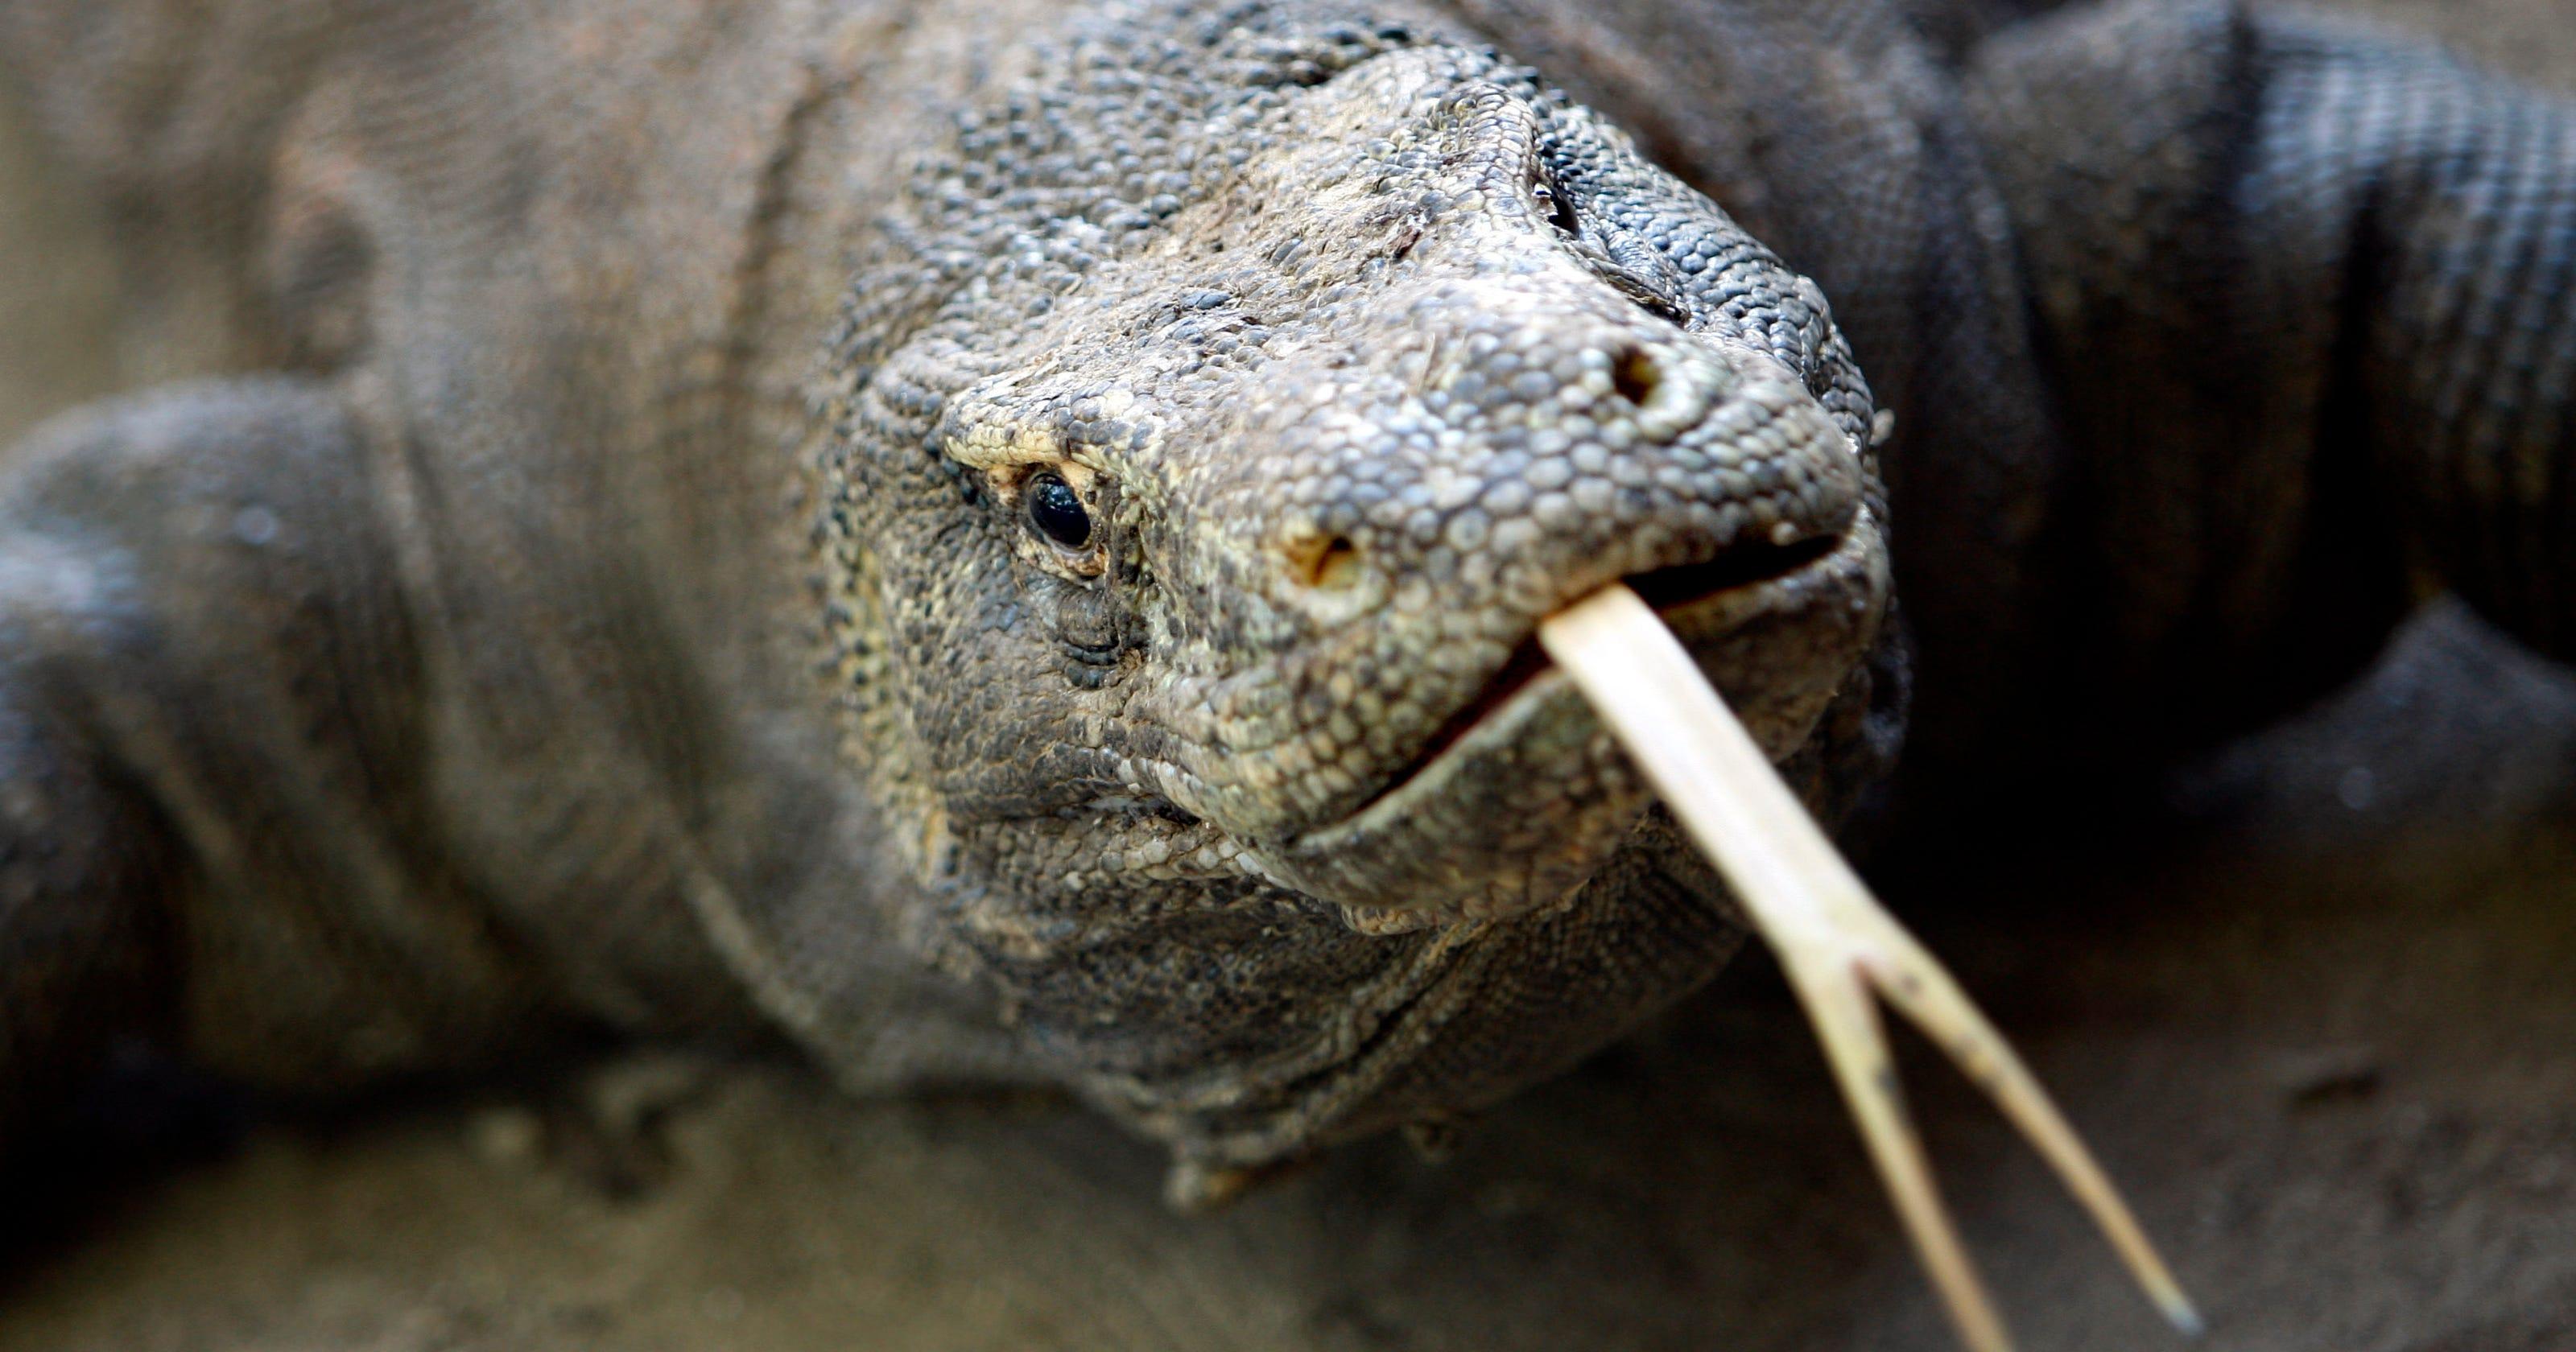 Police: Woman kills boyfriend after spat with reptilian cult